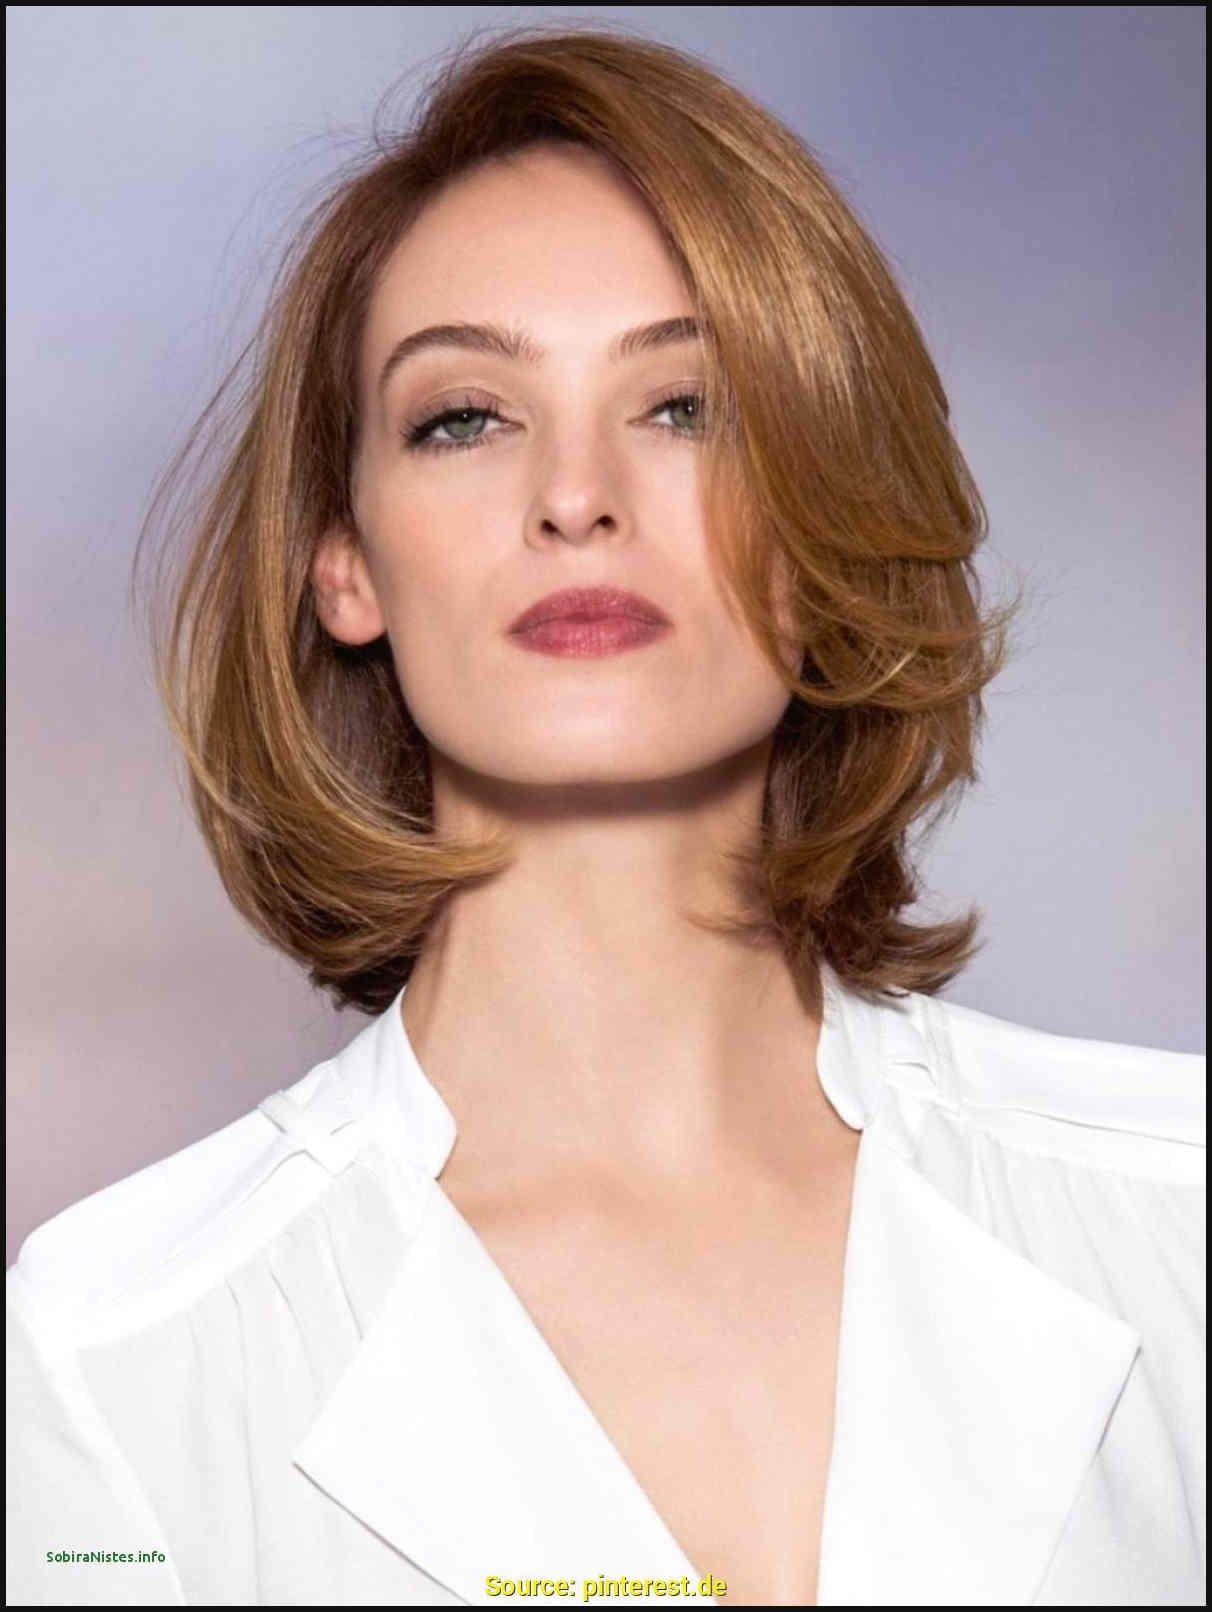 30 Tolle Moderne Frisuren Lange Haare Kreativ Frisuren Trends